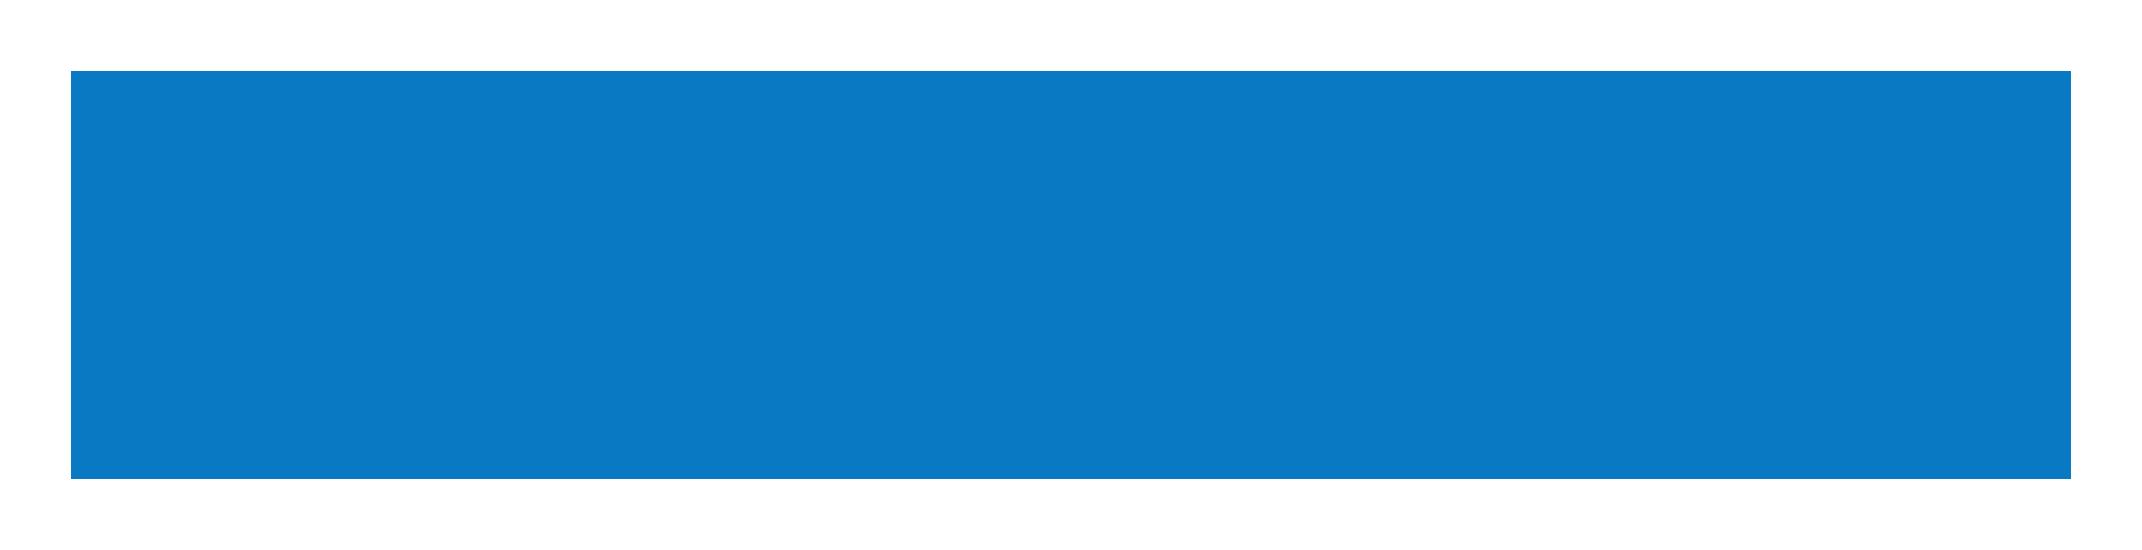 Renpho Group